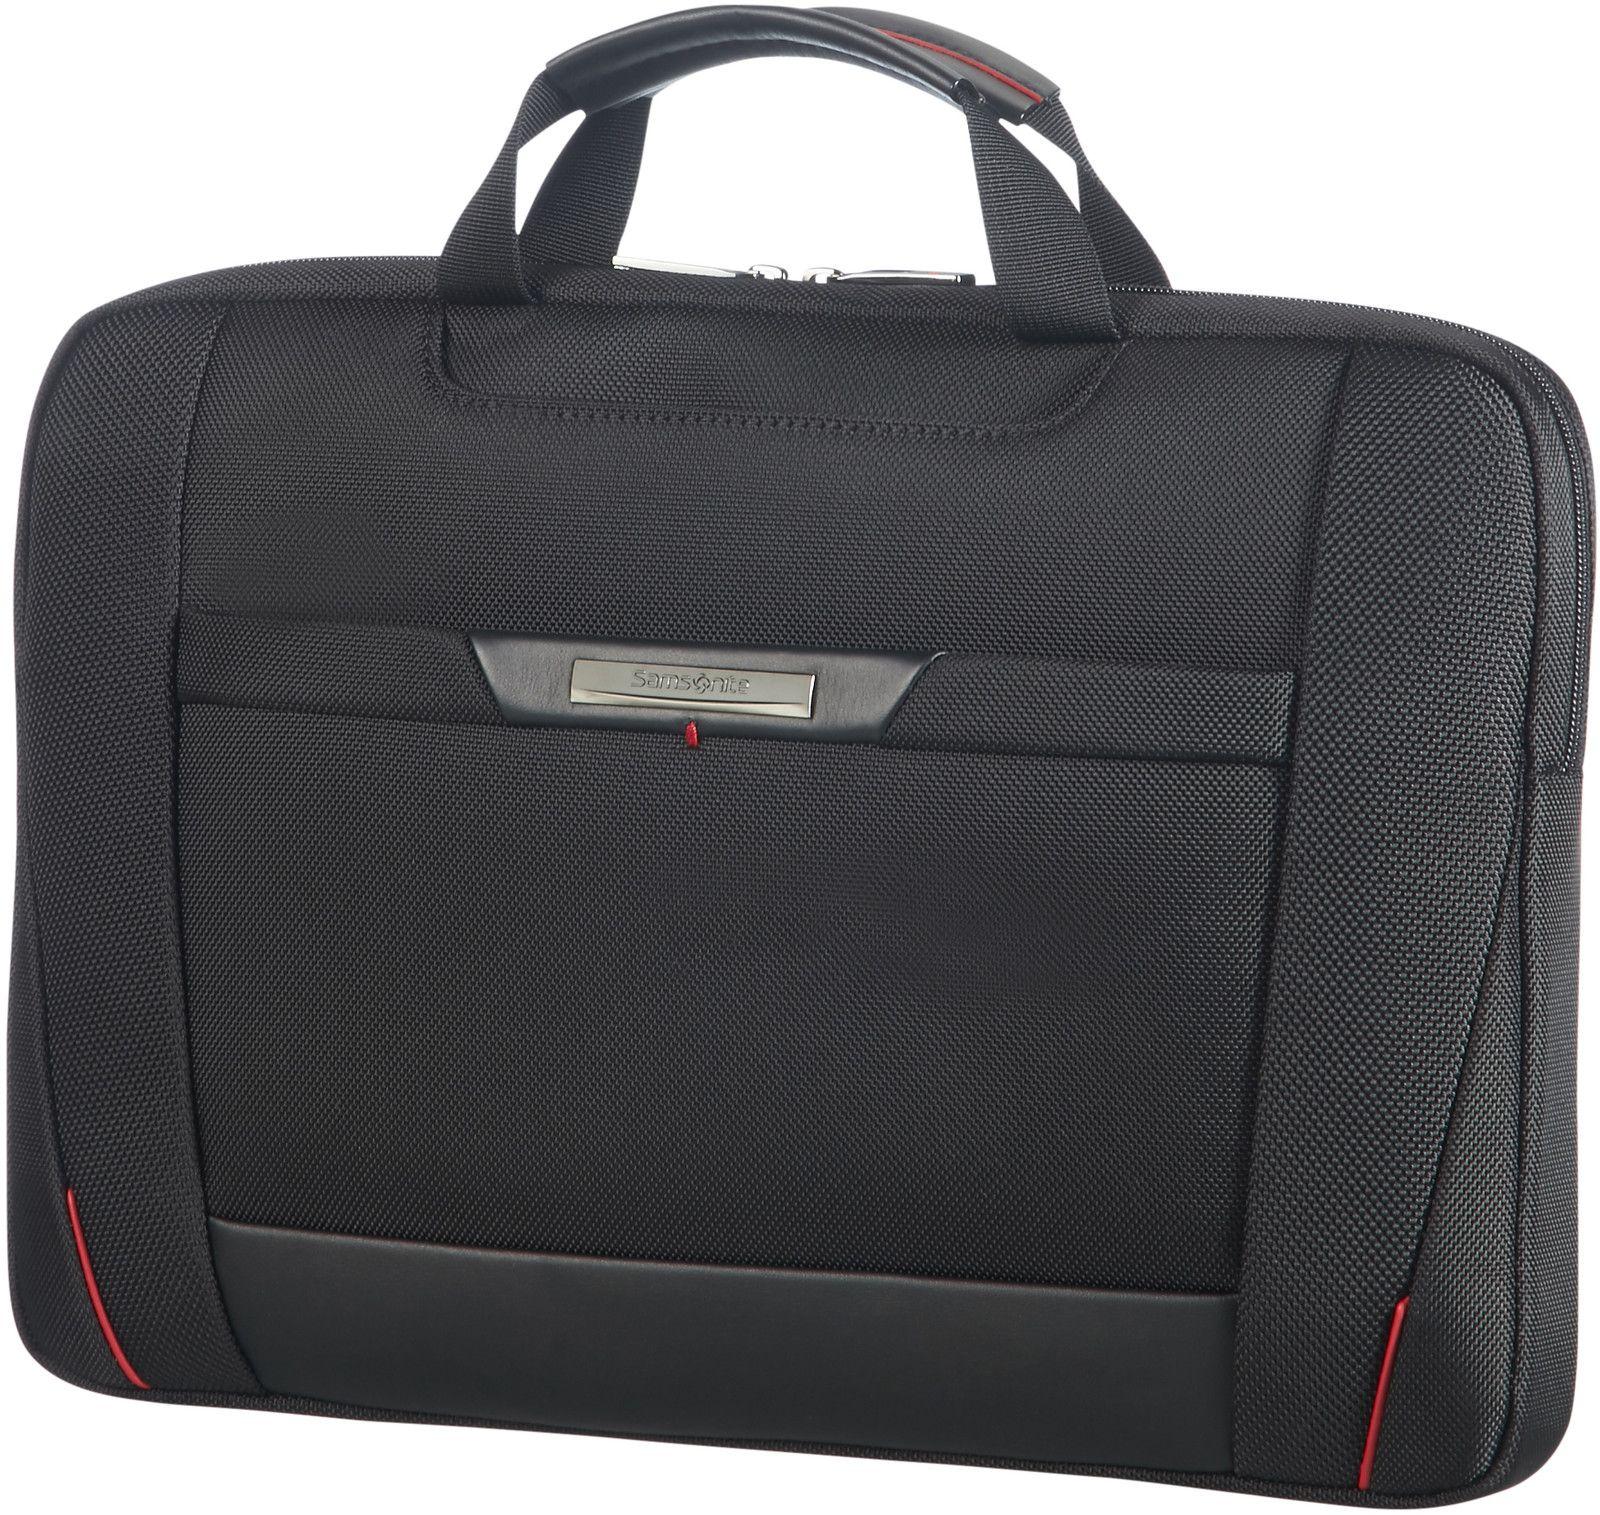 "Samsonite Dator Sleeve Pro DLX5 (15"")"